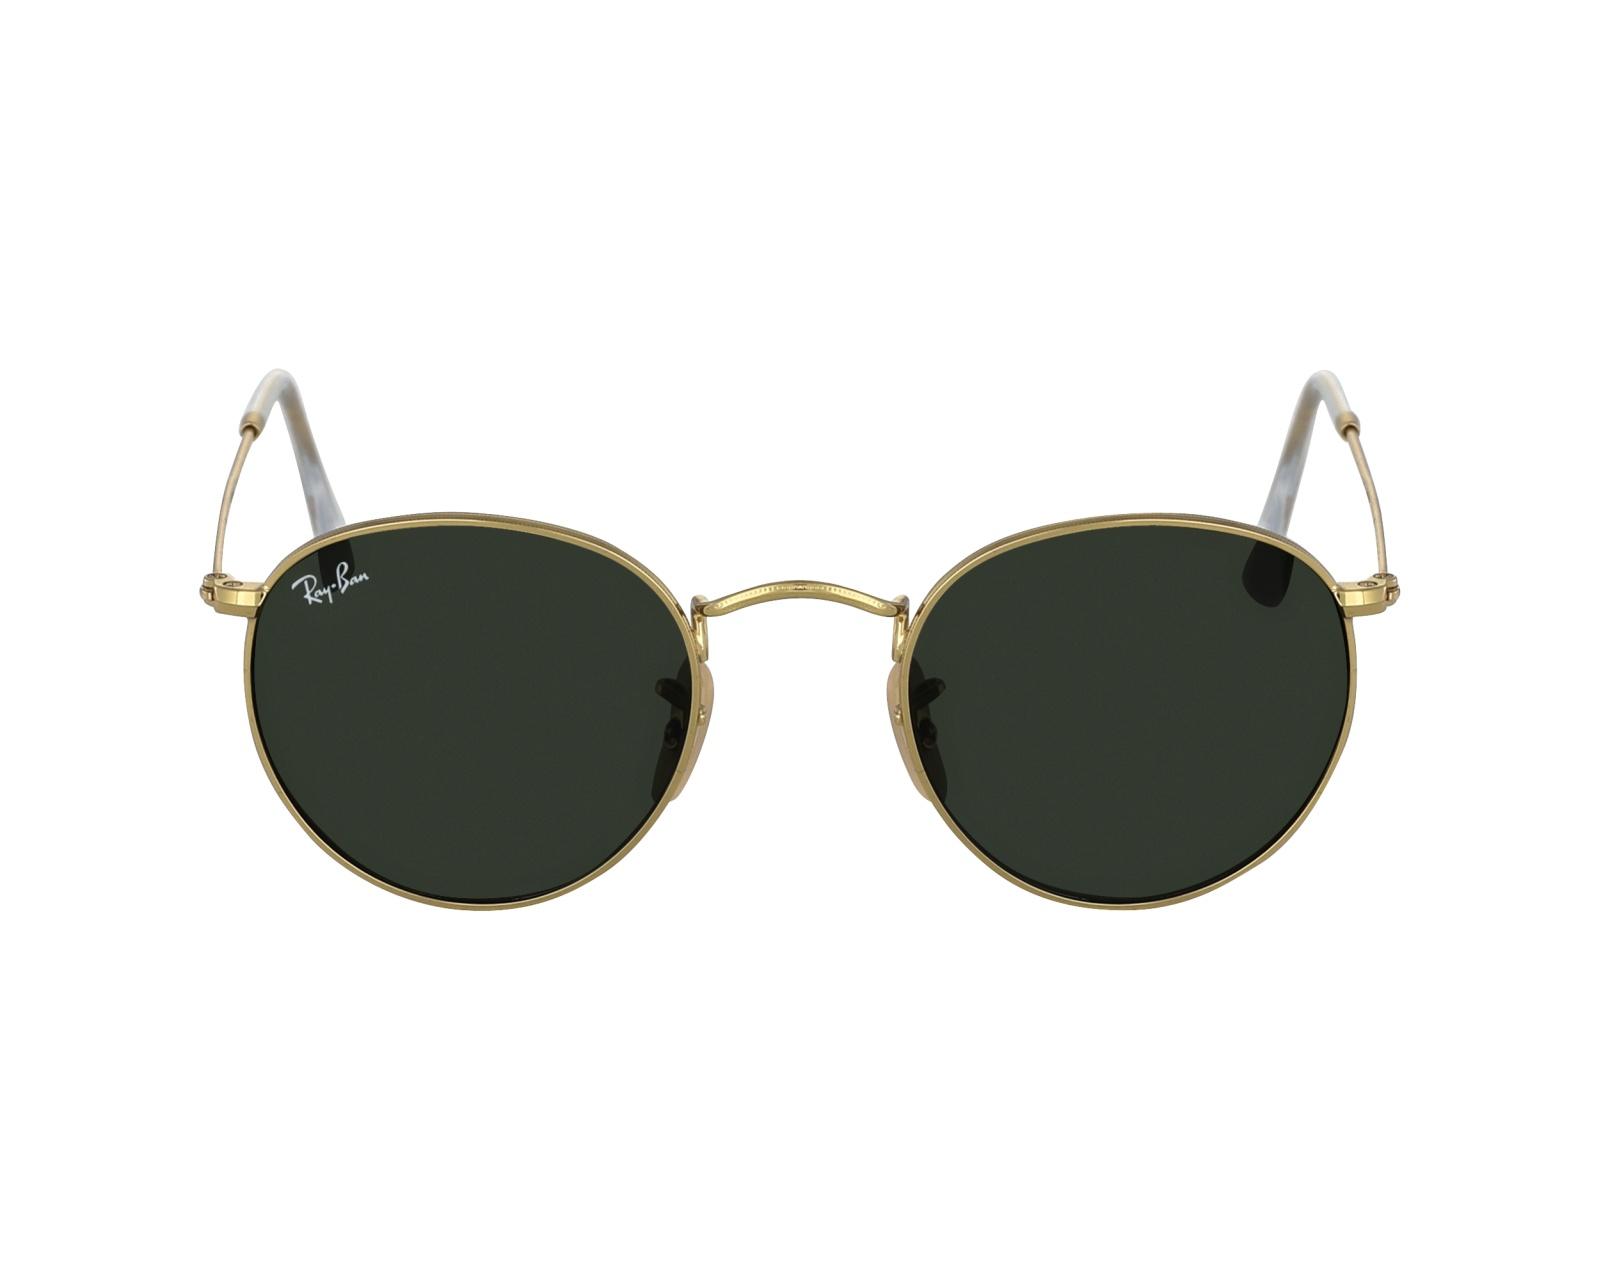 Ray-Ban Sonnenbrille RB-3447 001 gold - Gläser: brau-grün - Visionet